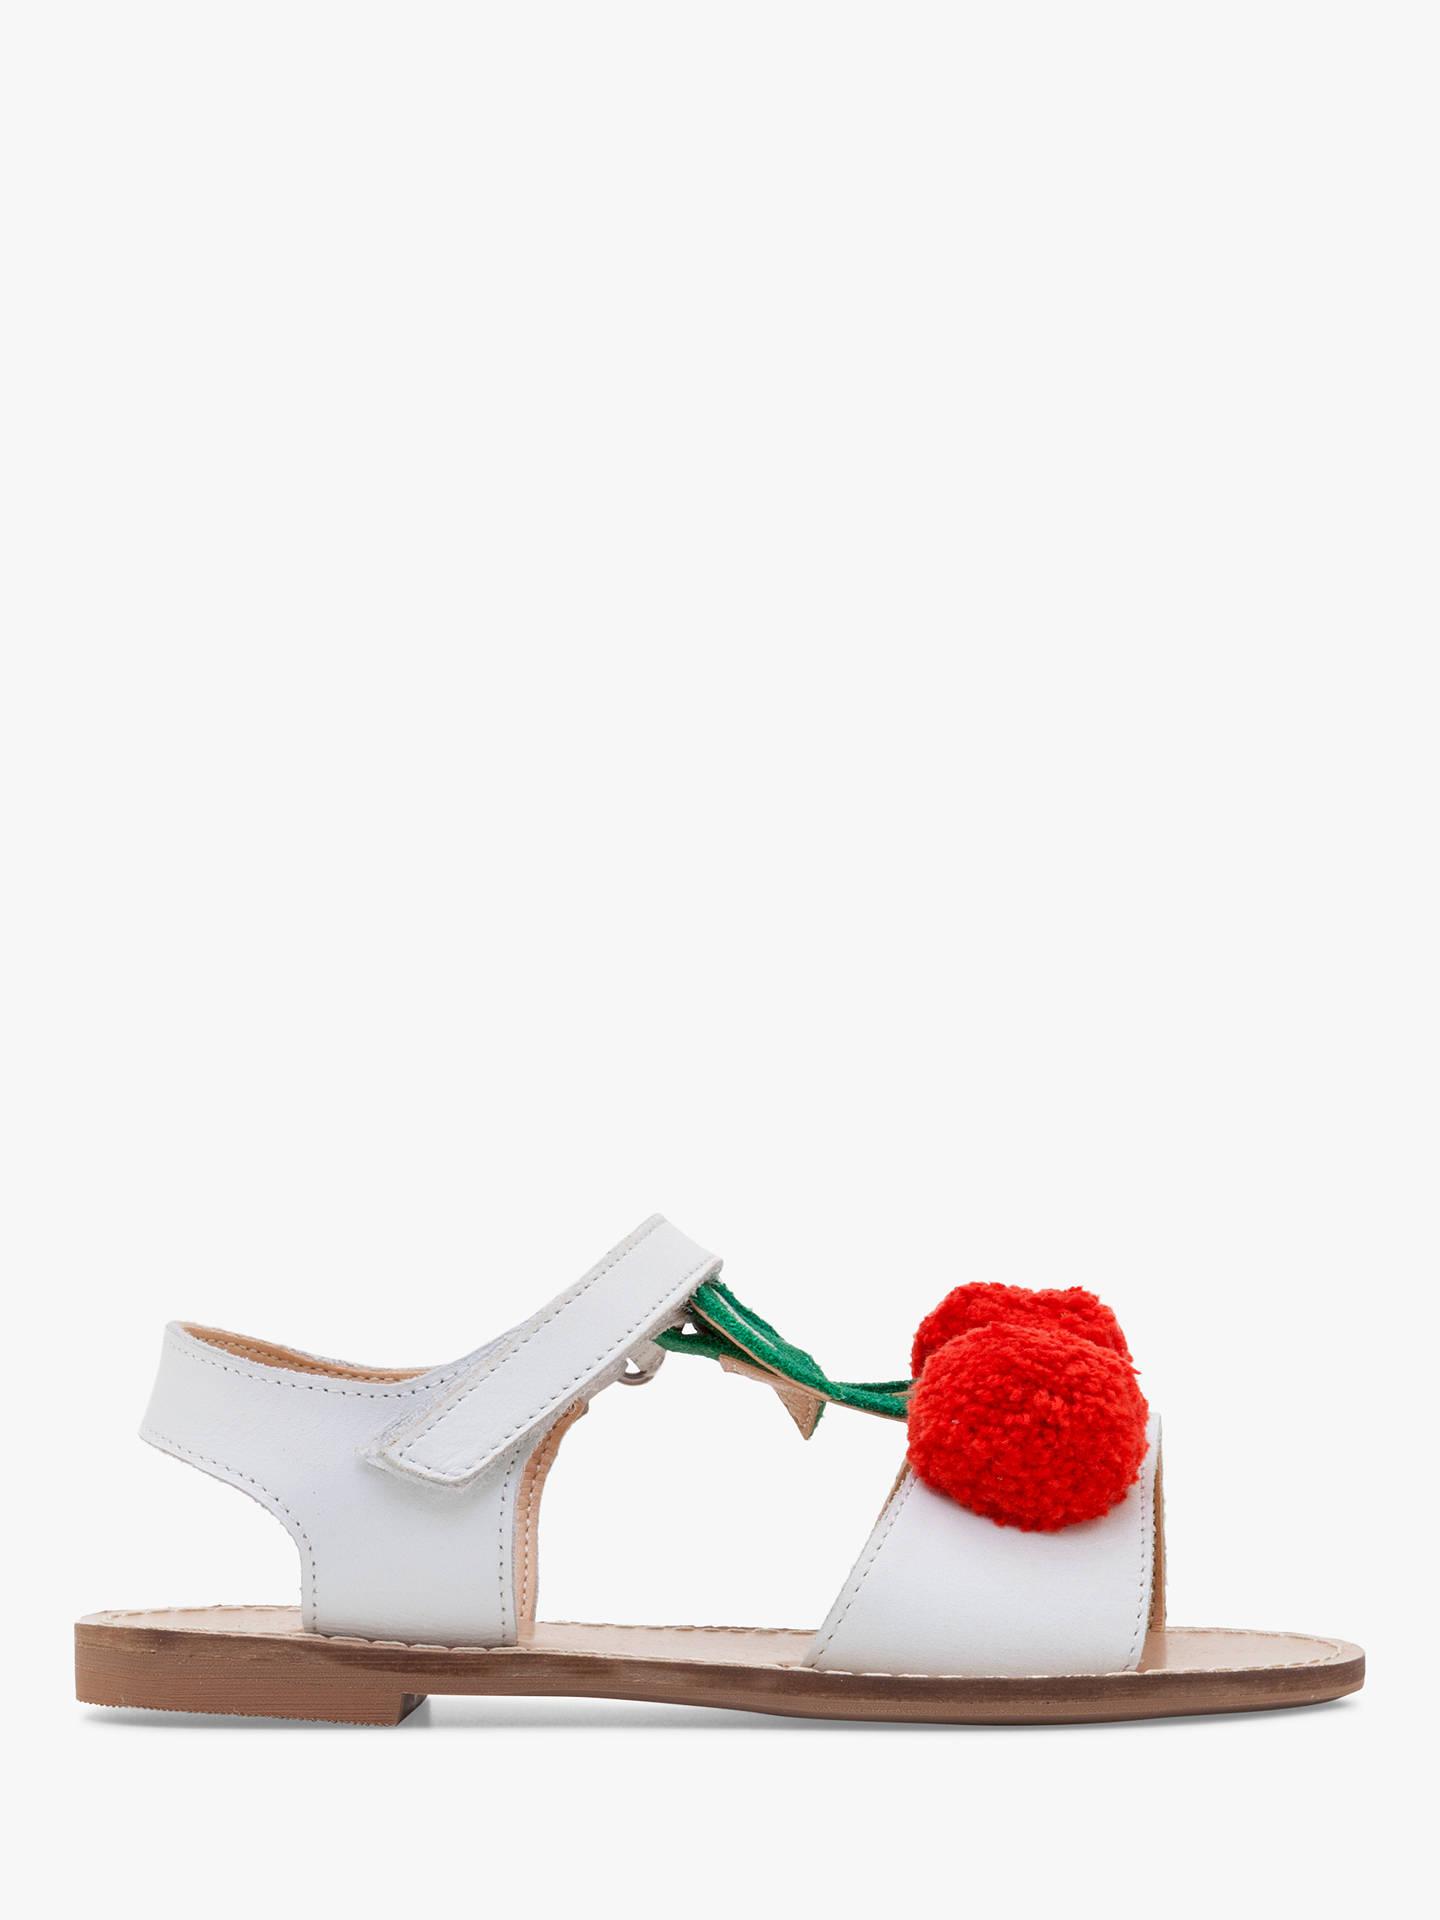 eb046b542ff91 Mini Boden Children's Leather Holiday Sandals, White